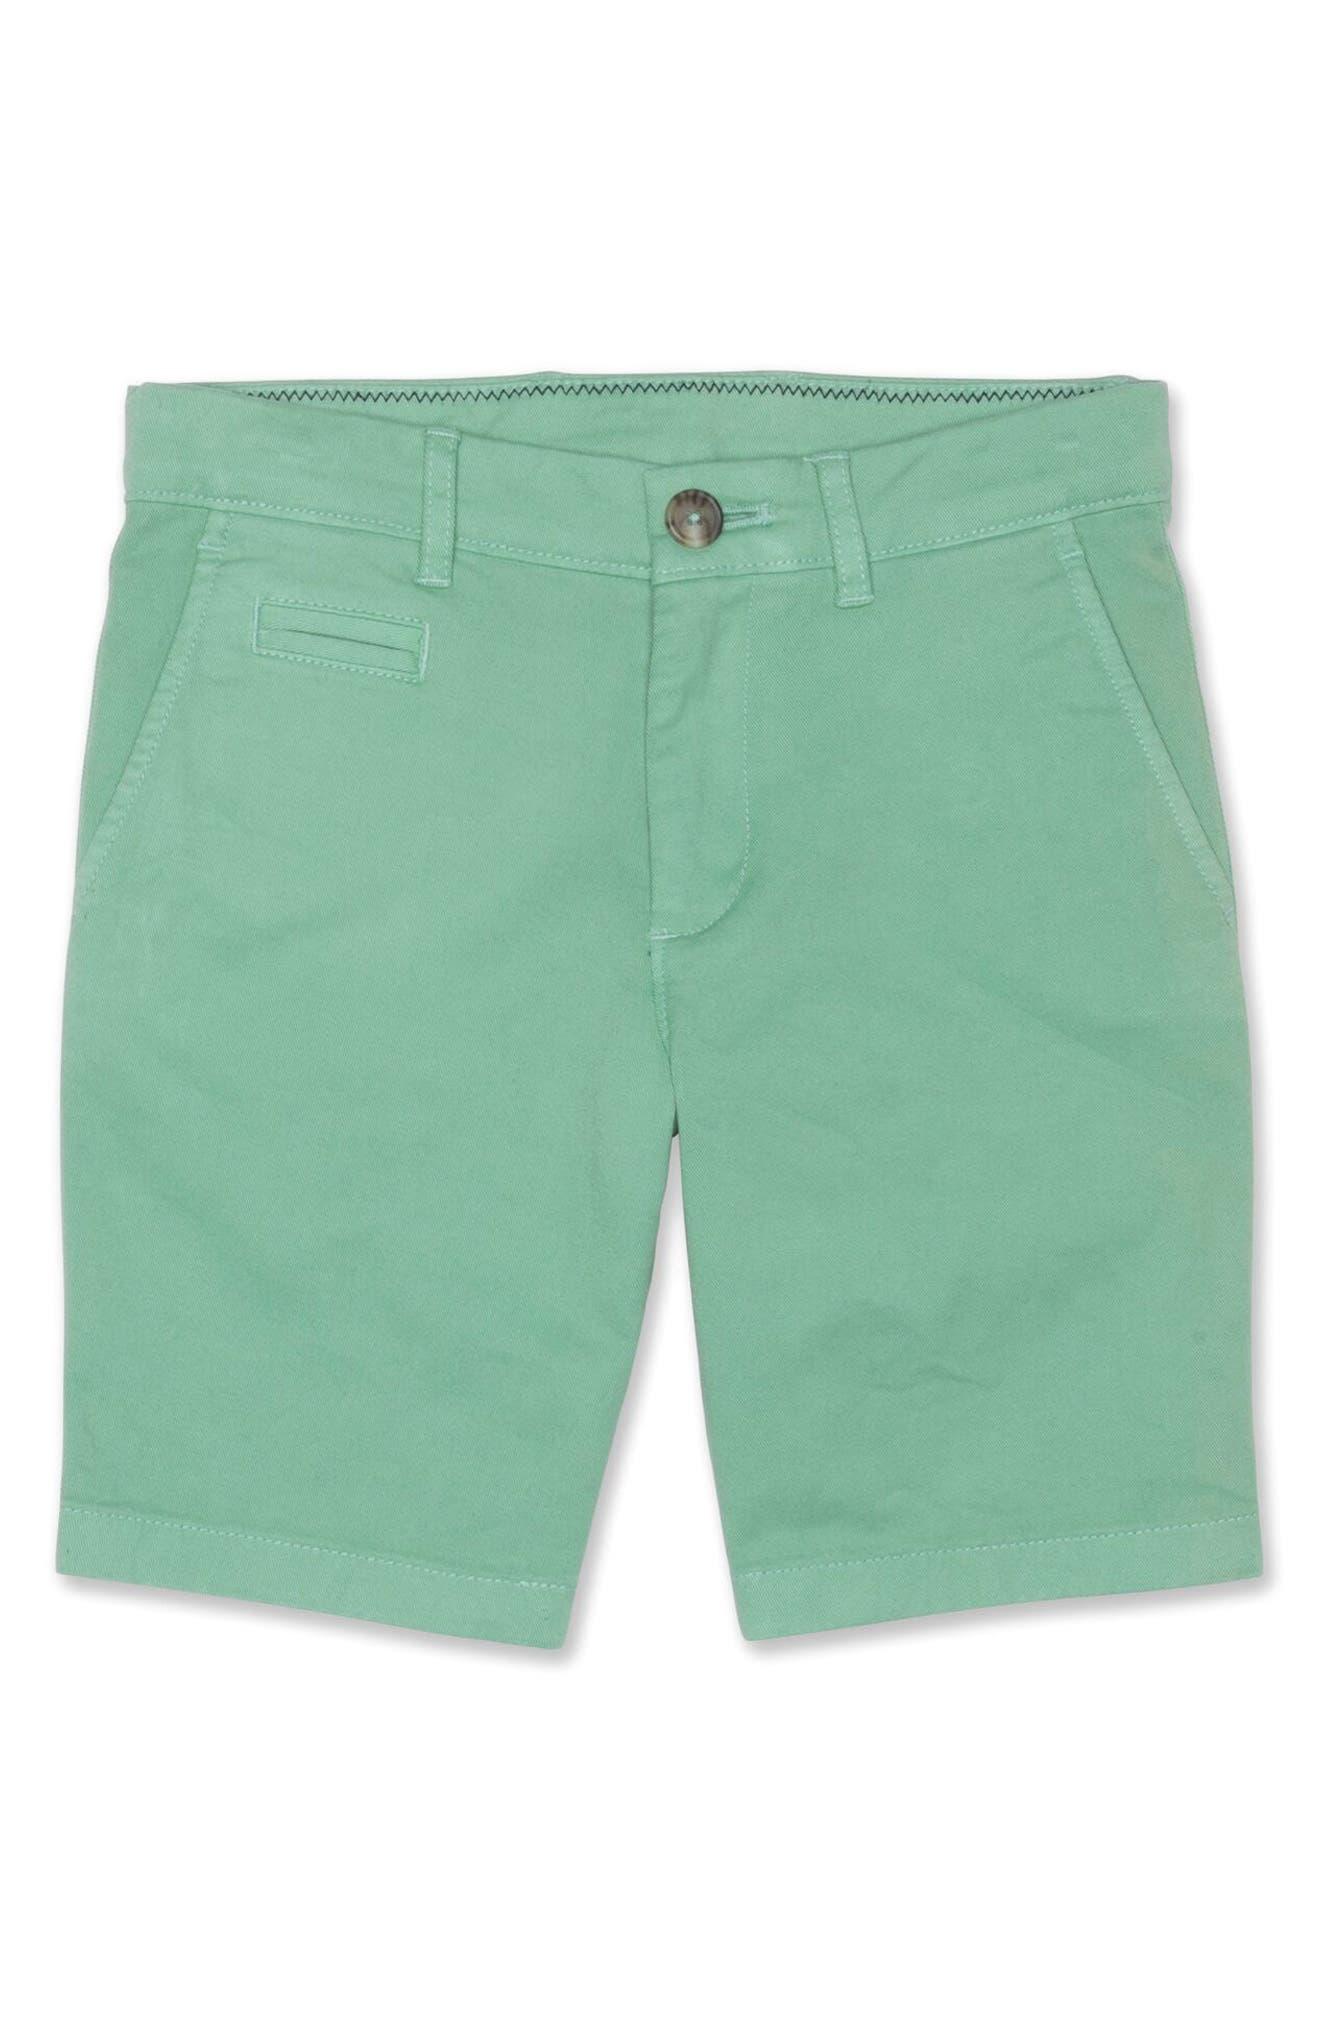 Boys JohnnieO Neal Twill Shorts Size 10  Green